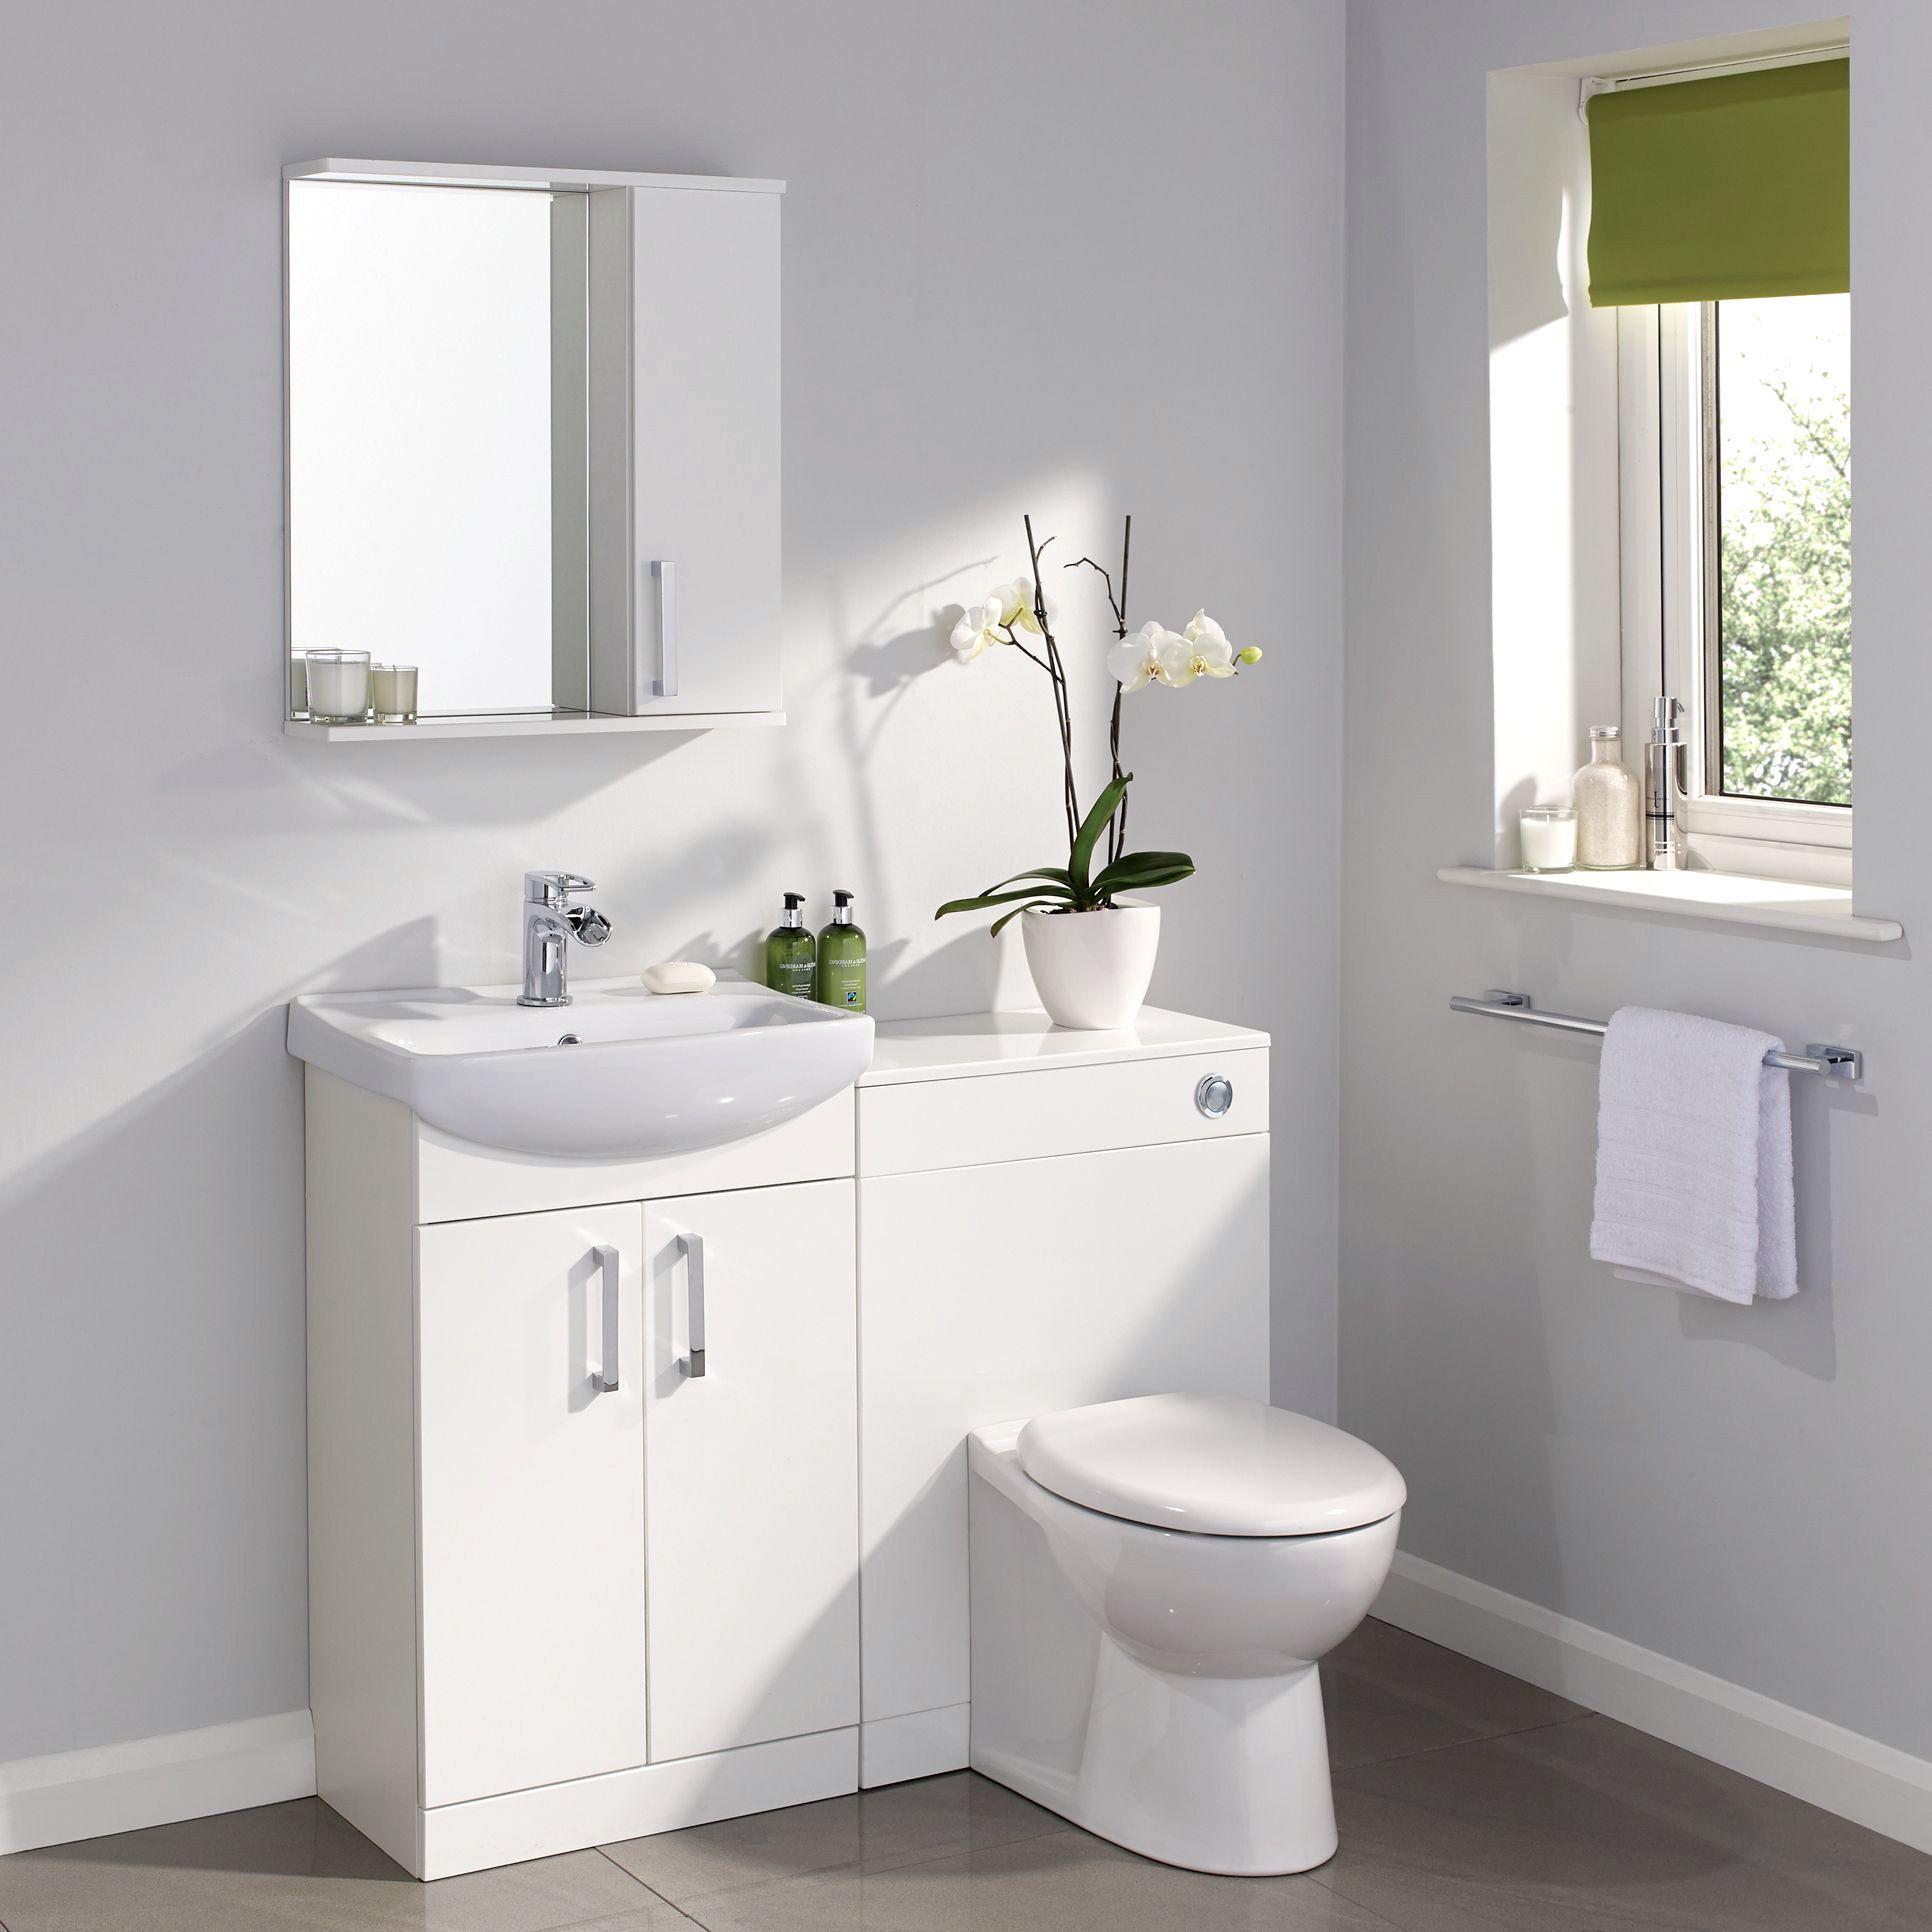 36+ Bathroom furniture at bq type